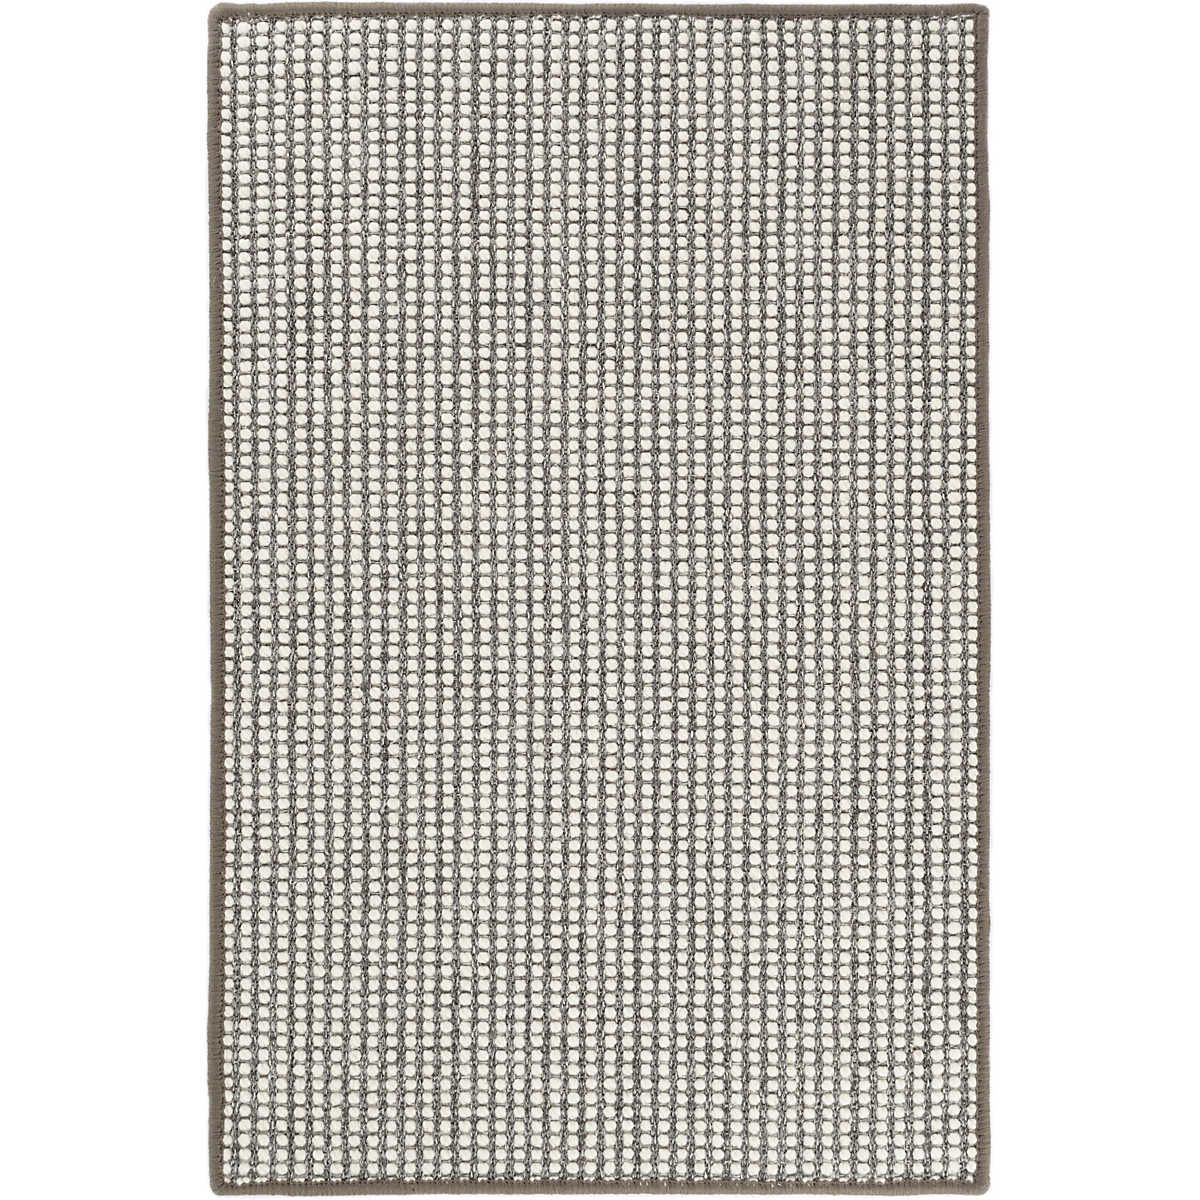 Dash and Albert Pixel Grey Woven Sisal Wool Rug